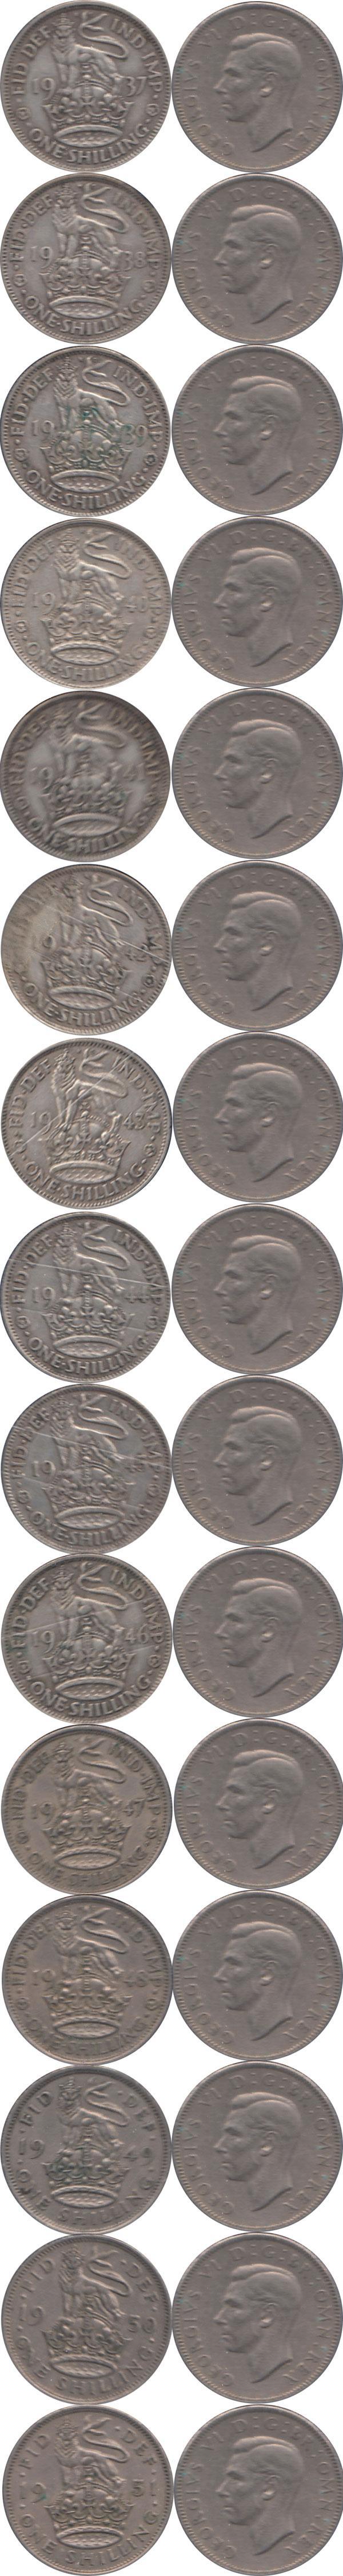 Каталог монет - Великобритания Королевский шиллинг Георга